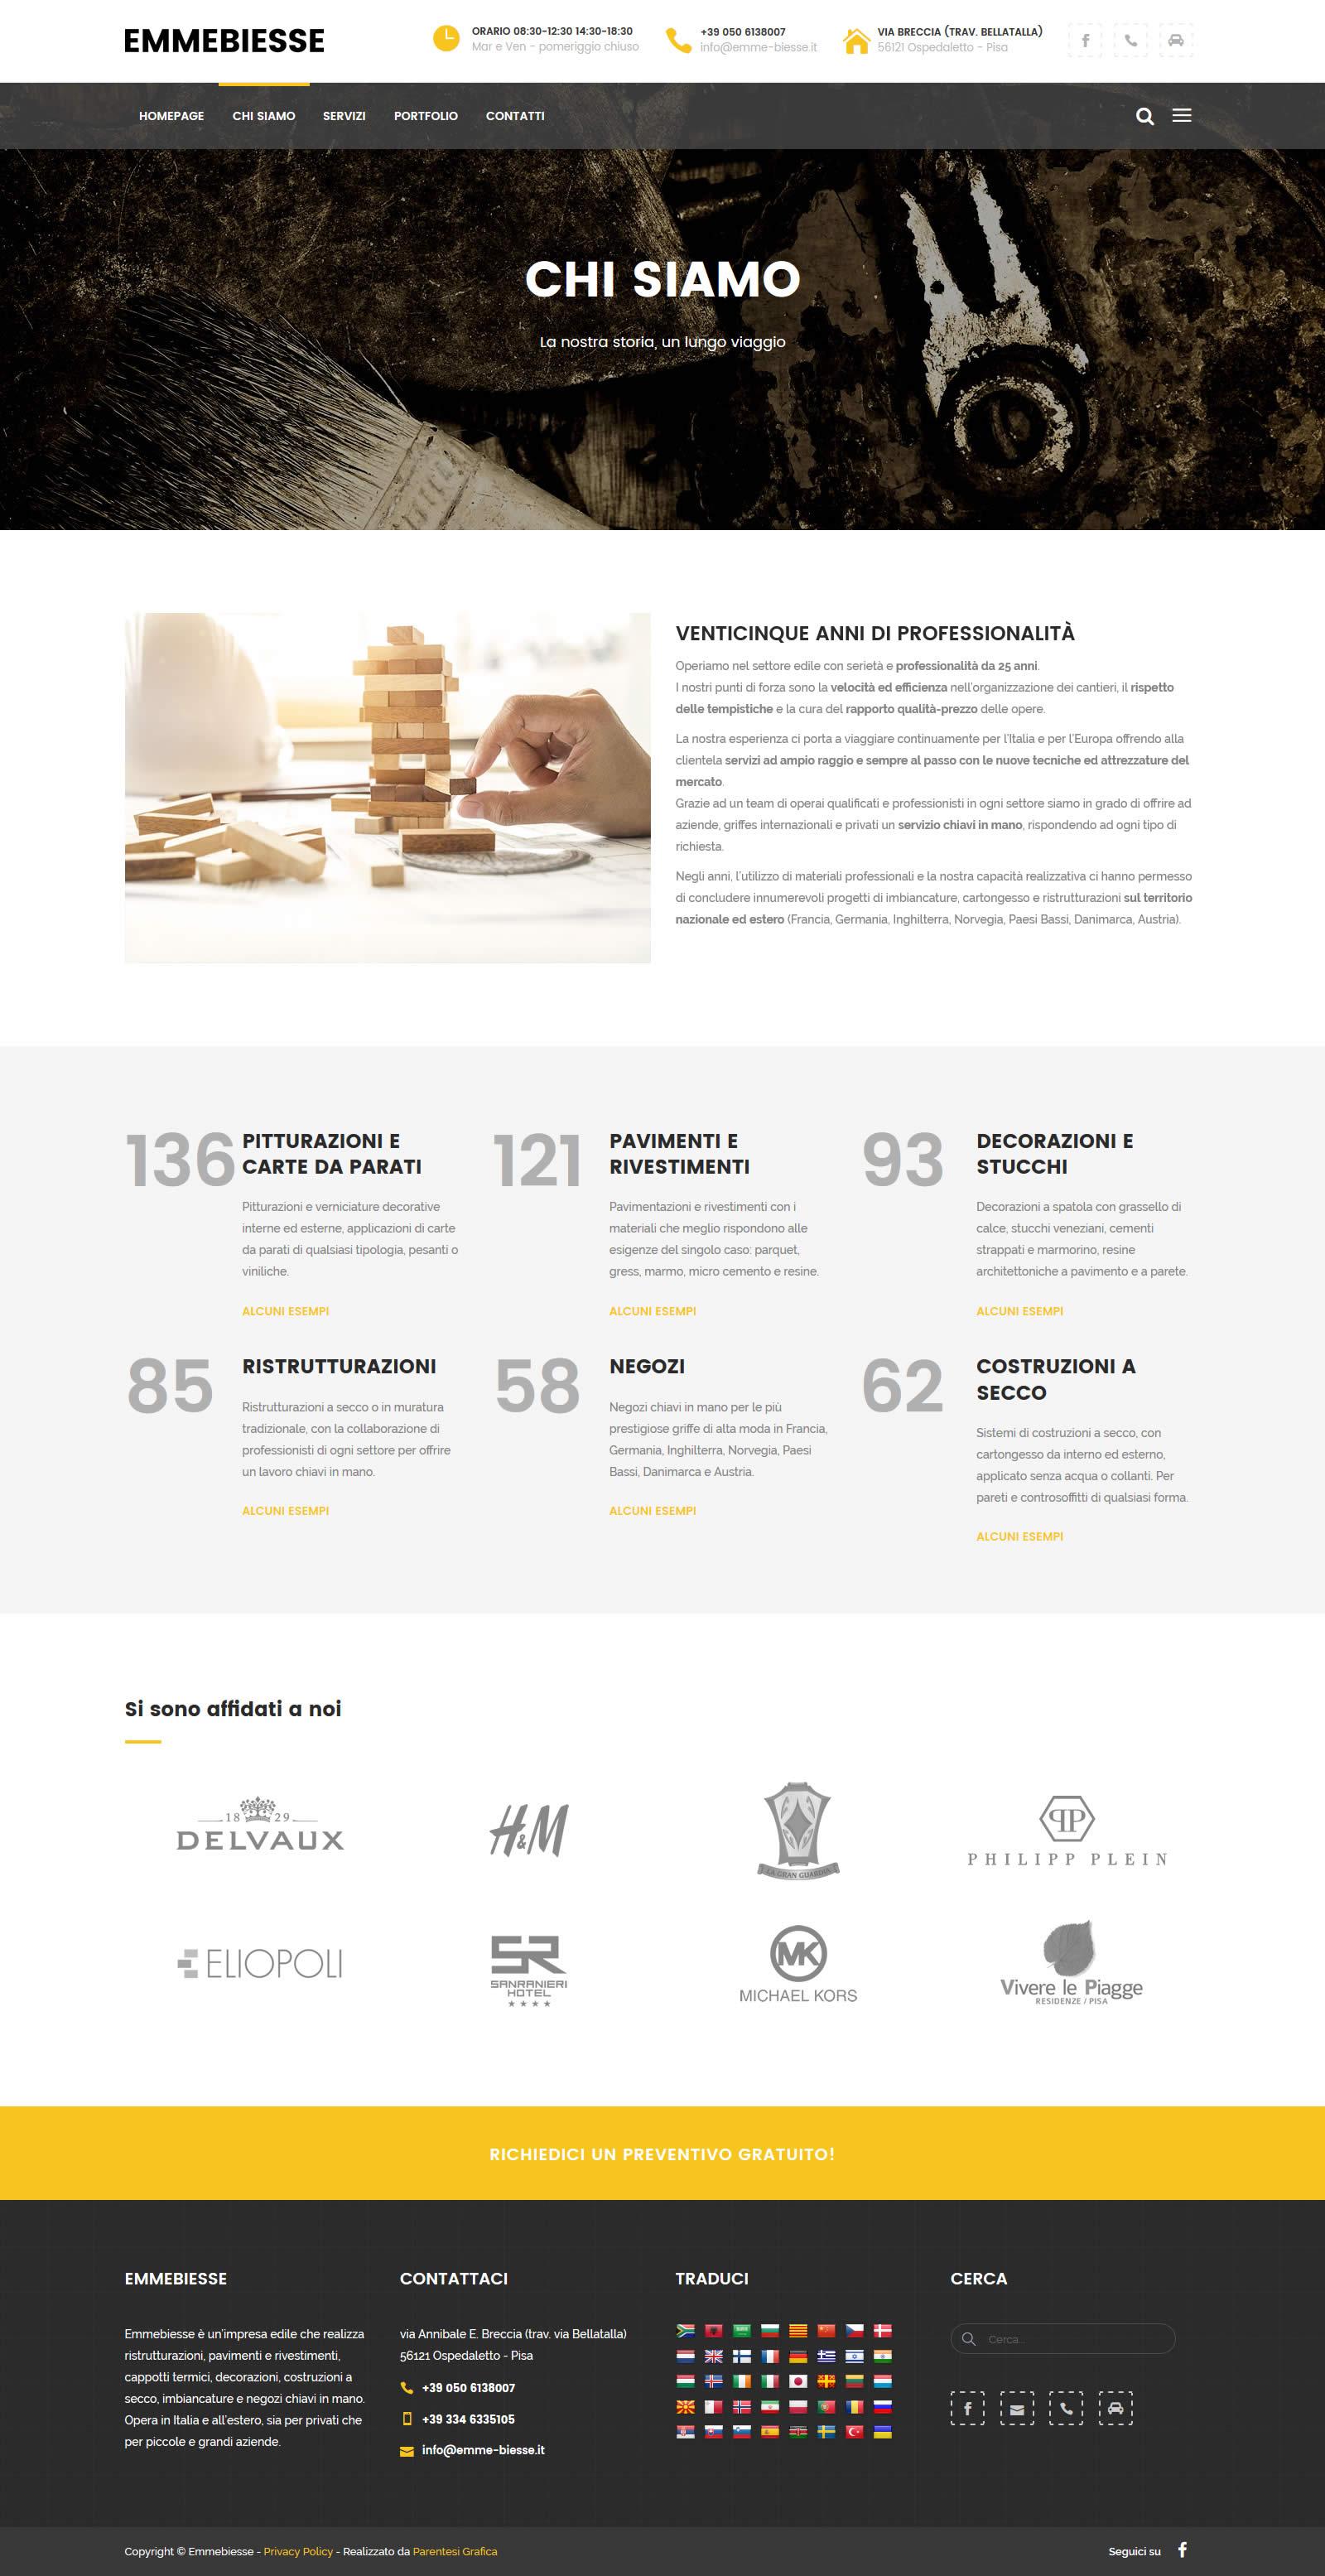 Sito web Emmebiesse - pagina chi siamo